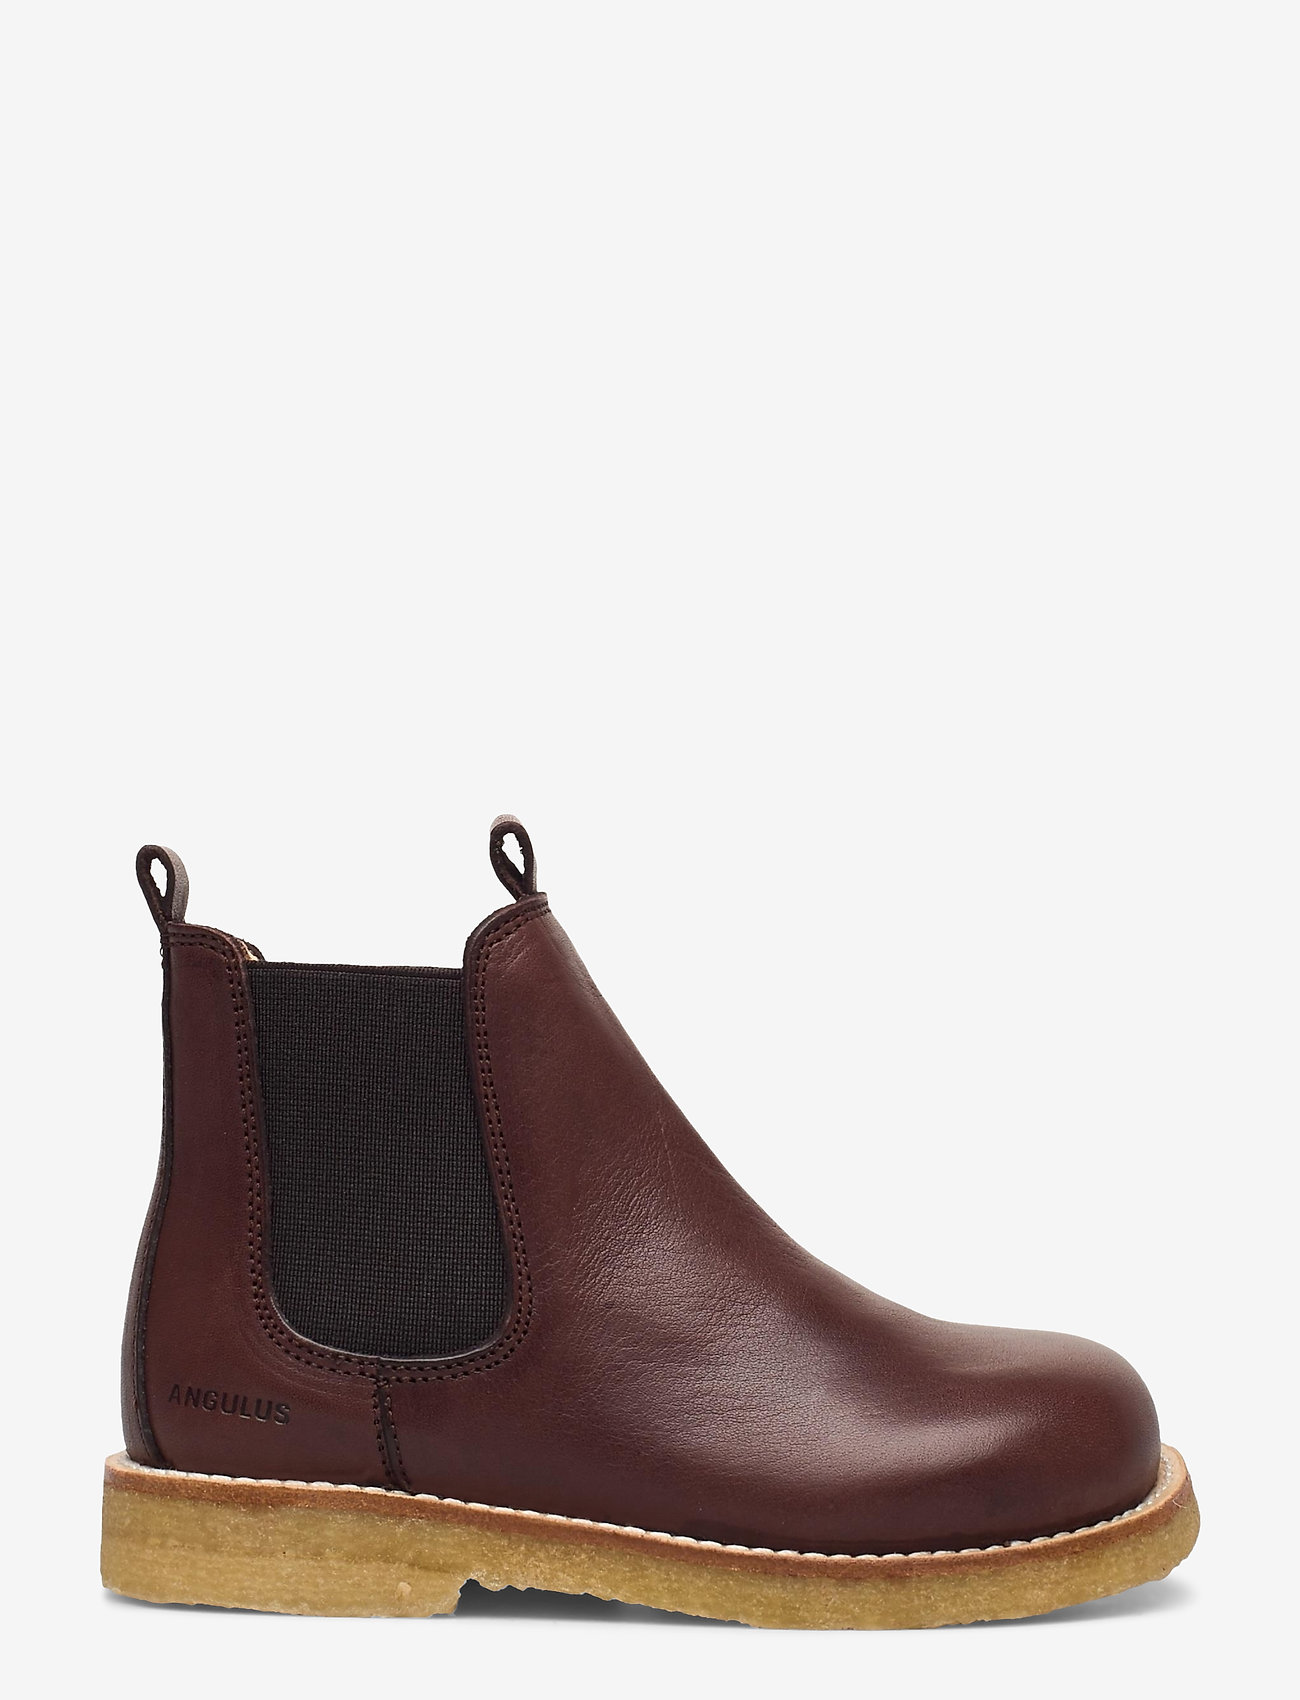 ANGULUS - Chelsea boot - sko - 1547/002 dark brown/brown - 1